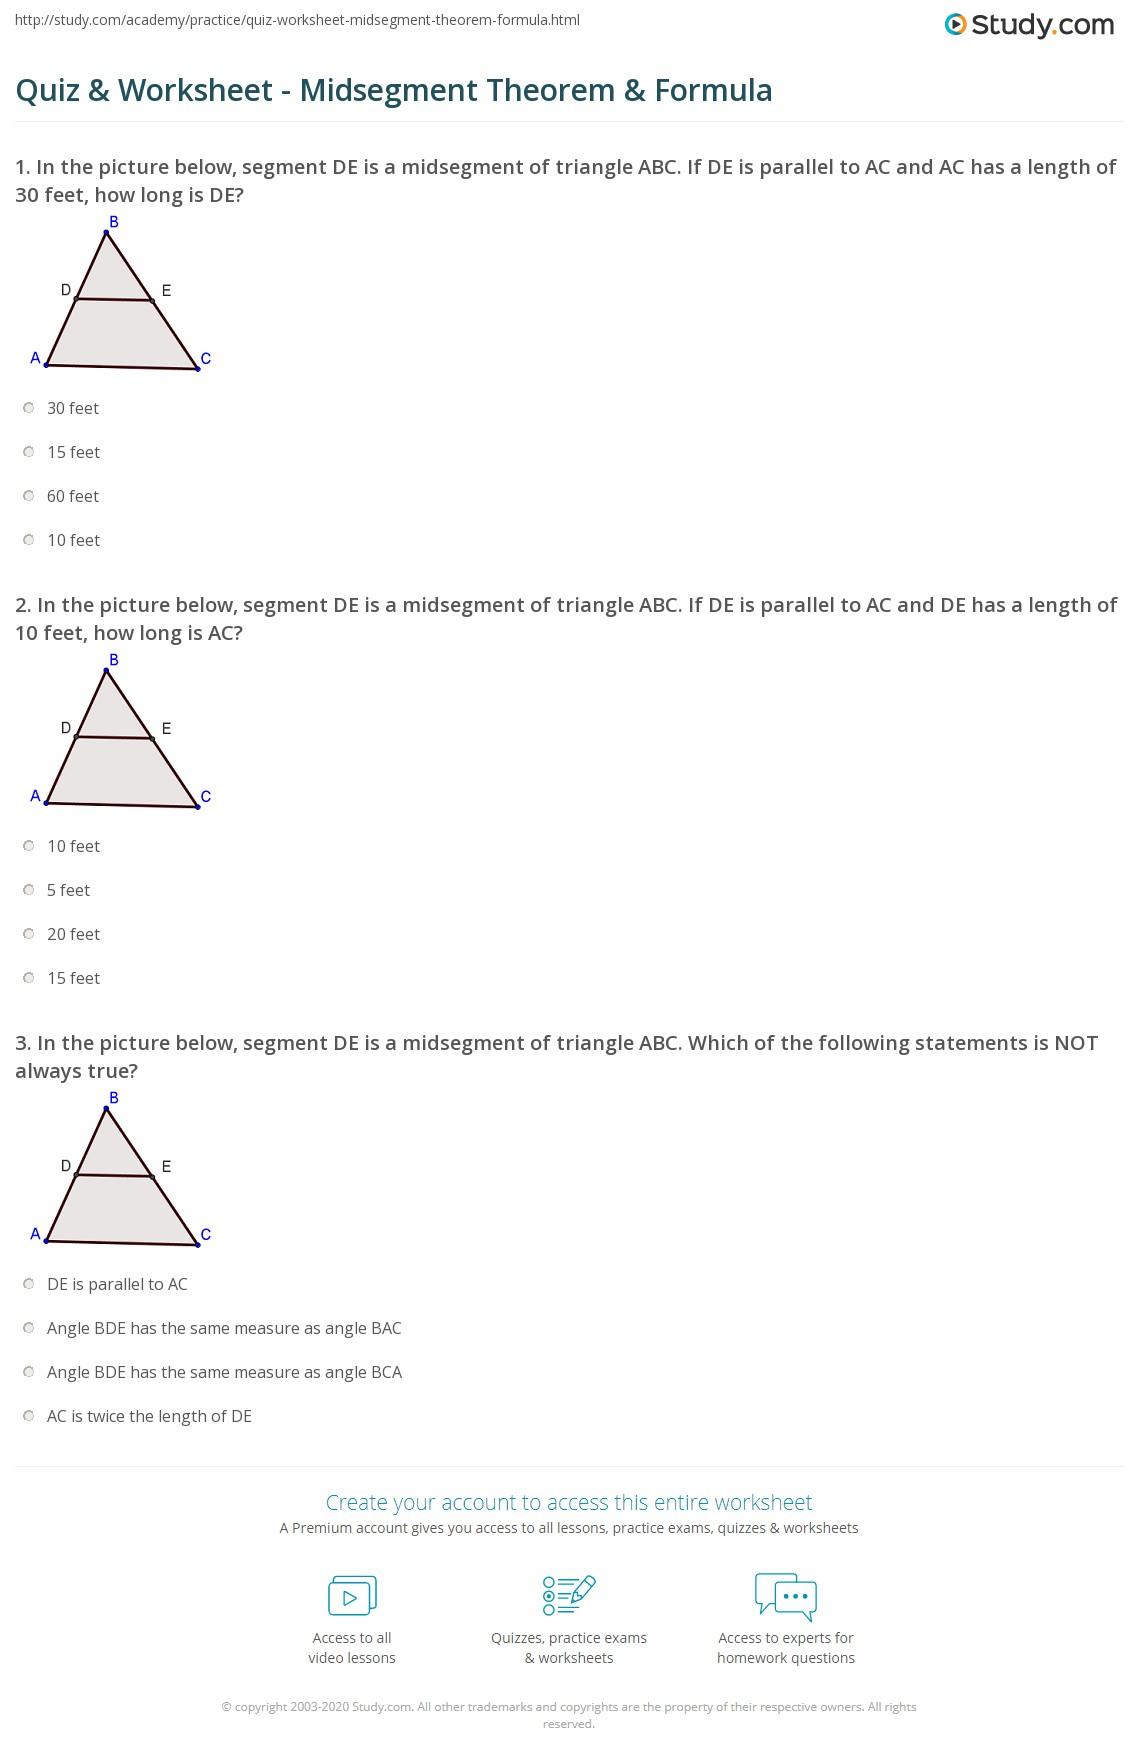 hight resolution of Quiz \u0026 Worksheet - Midsegment Theorem \u0026 Formula   Study.com